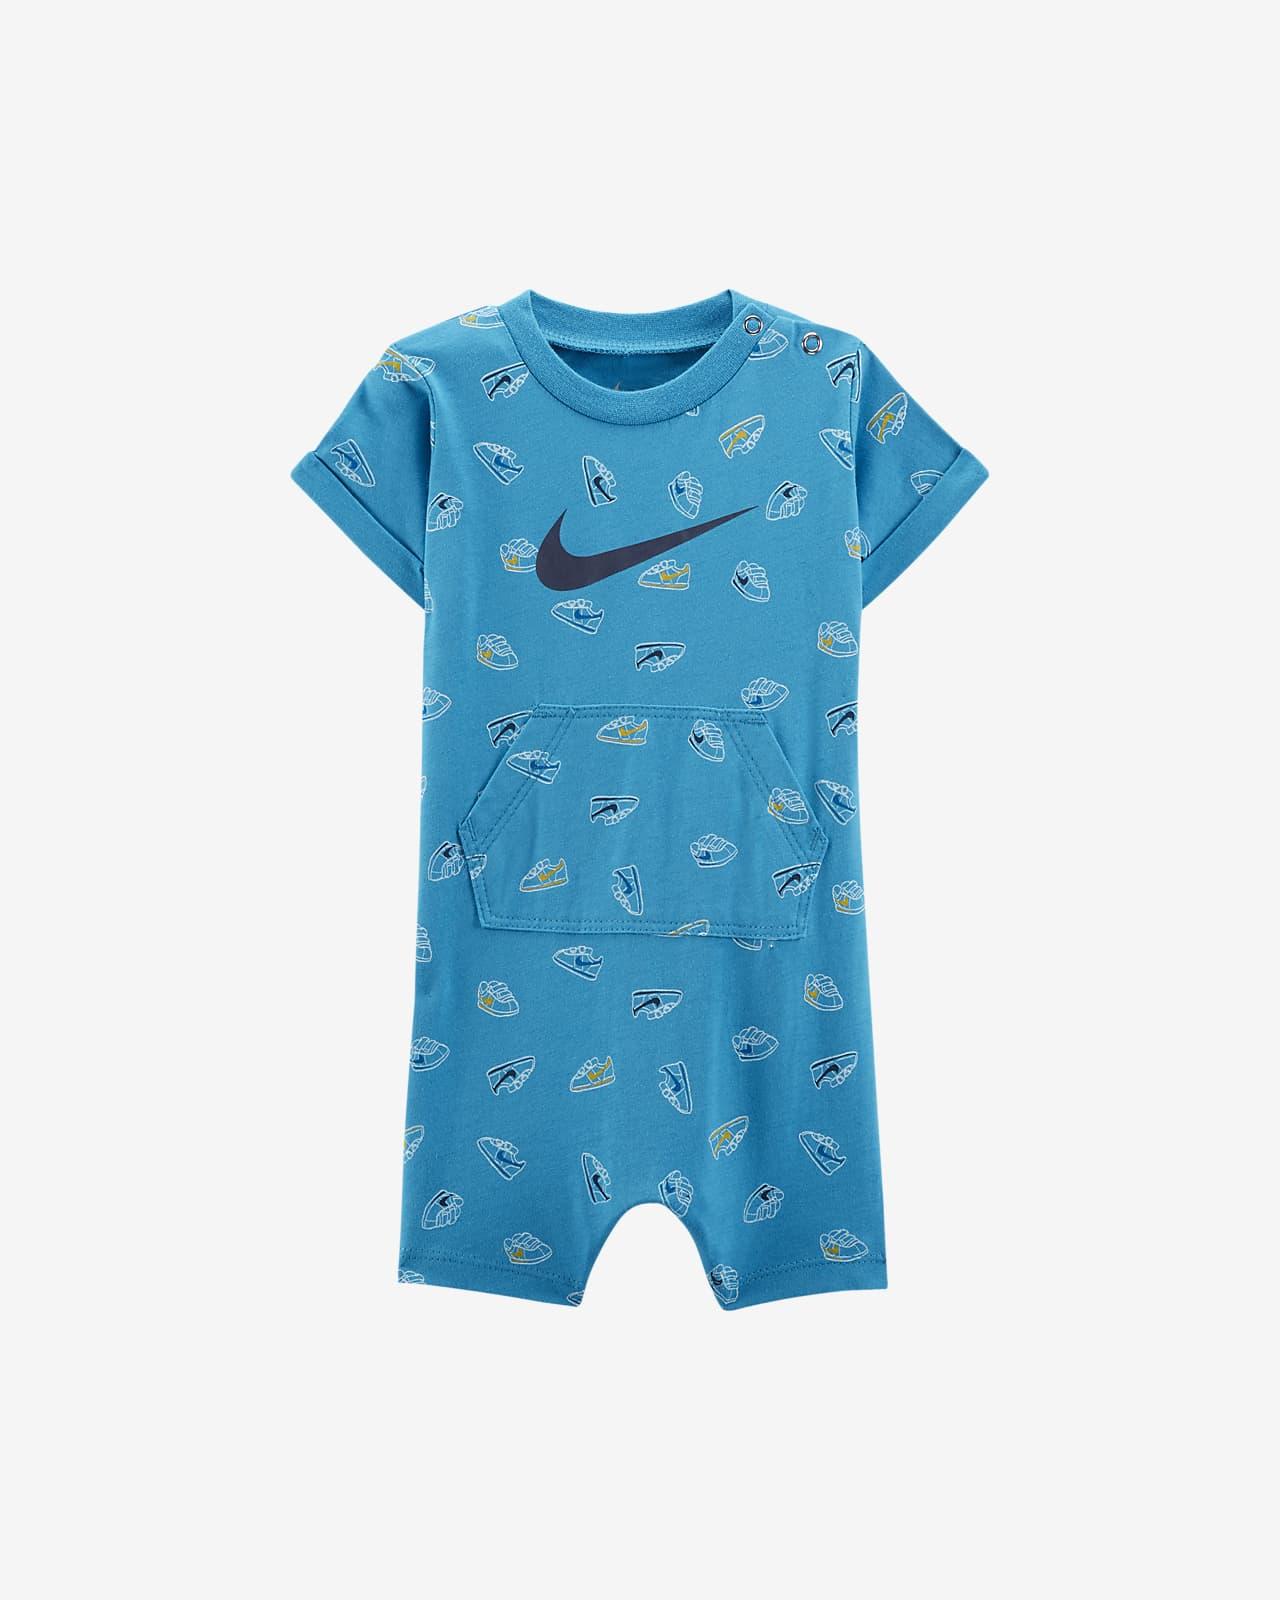 Nike Baby (0-9M) Romper